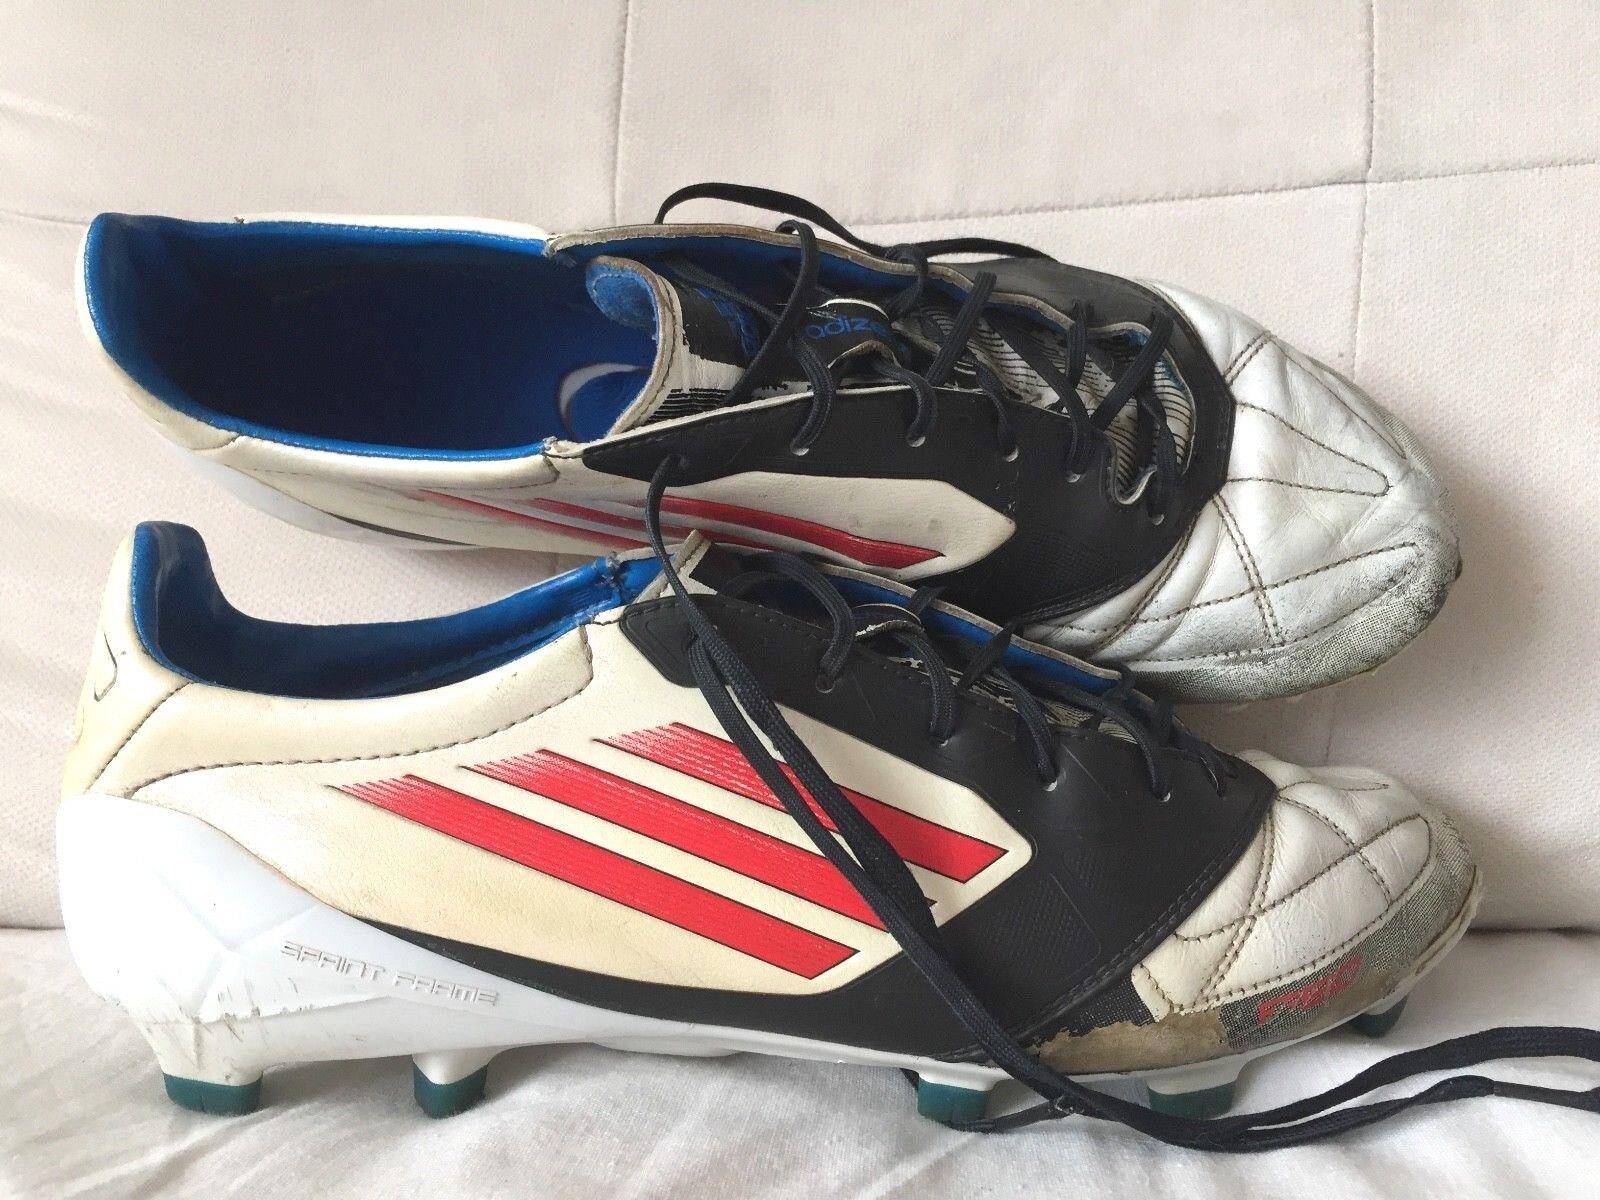 Adidas f50 adizero FG soccer cleats football stivali KLeather US10.5 Messi